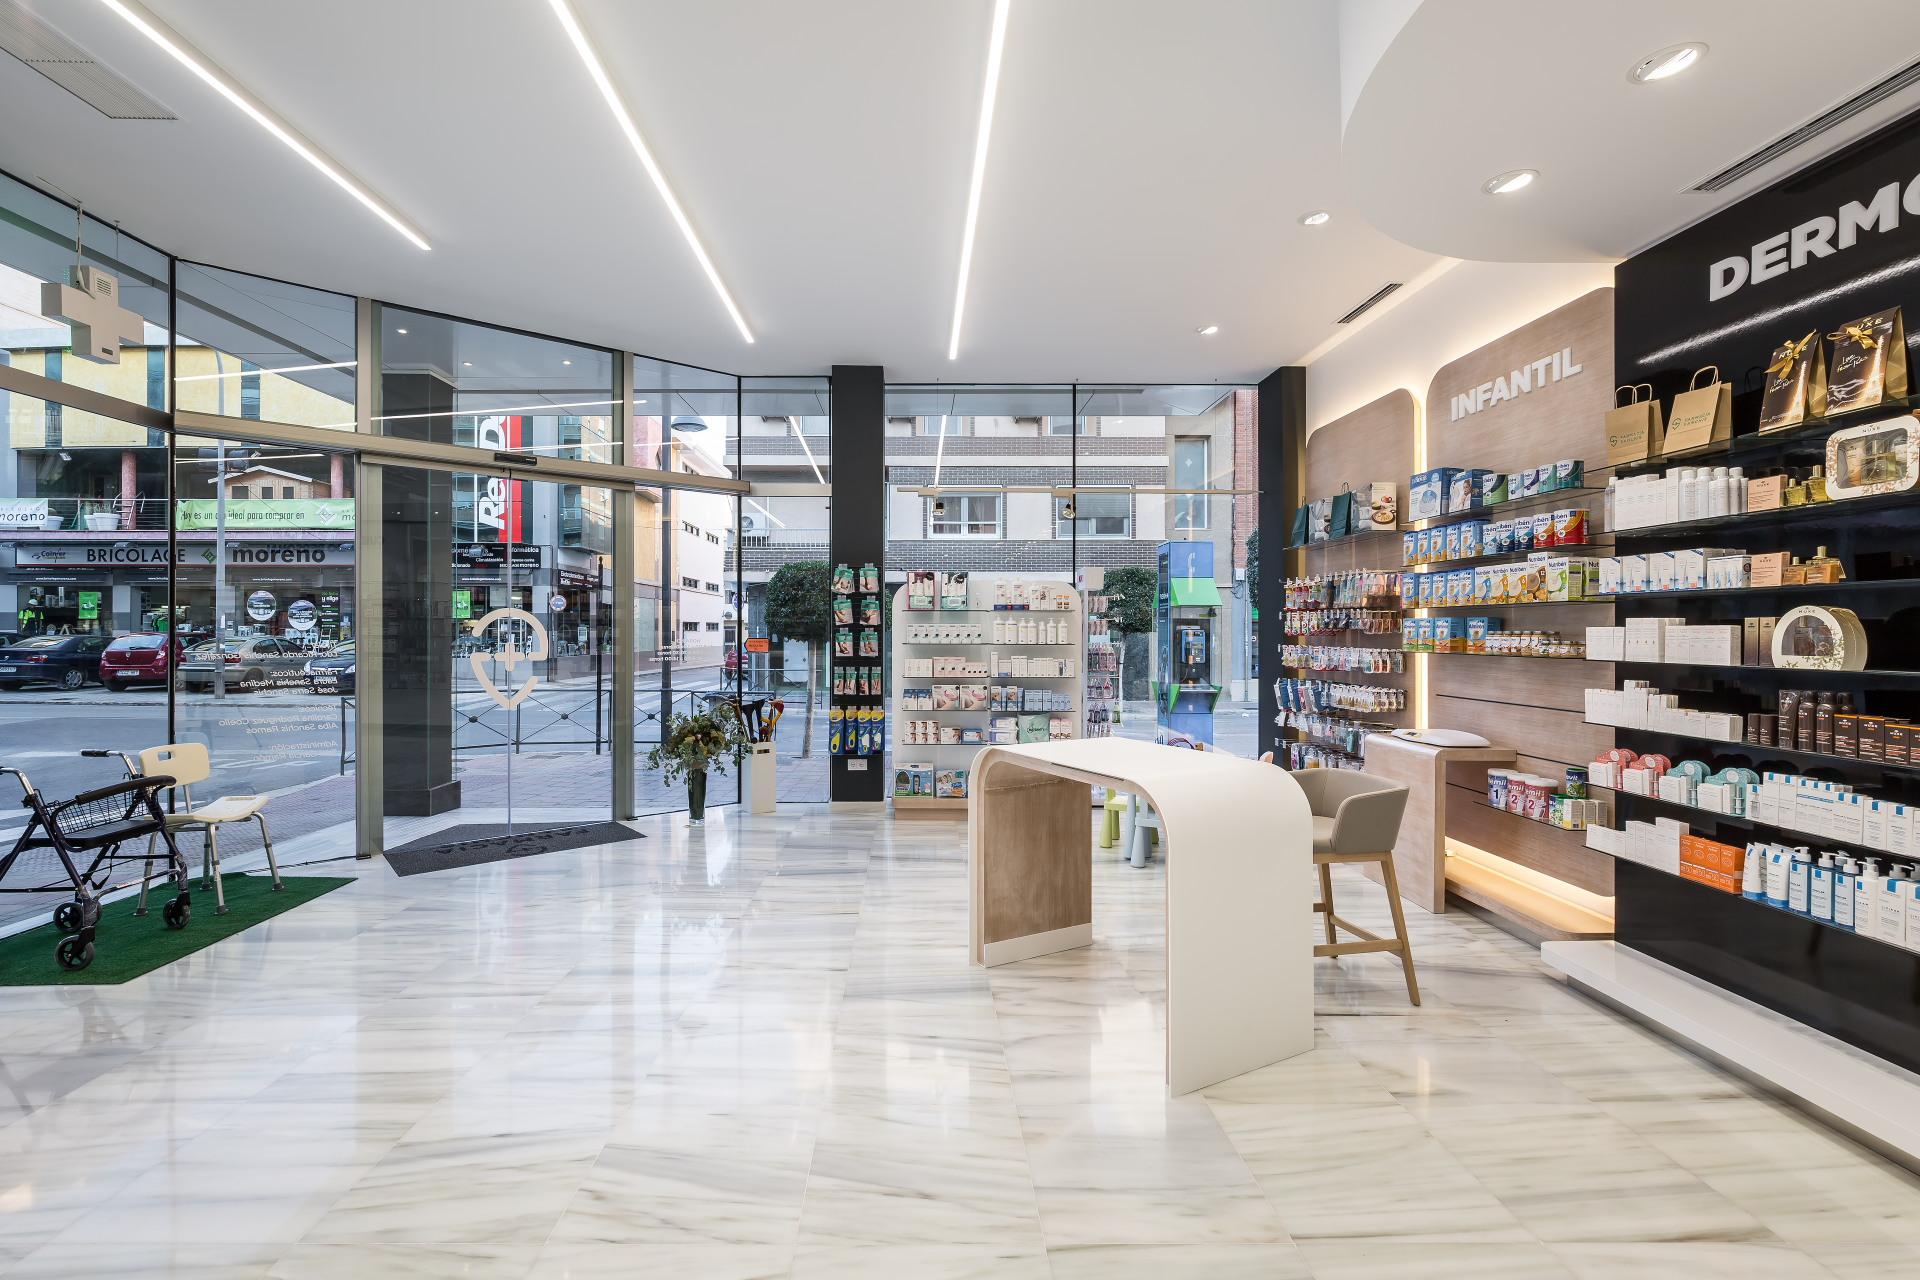 fotografia-arquitectura-valencia-german-cabo-d'estudio-farmacia-sanchis-ribarroja (25)